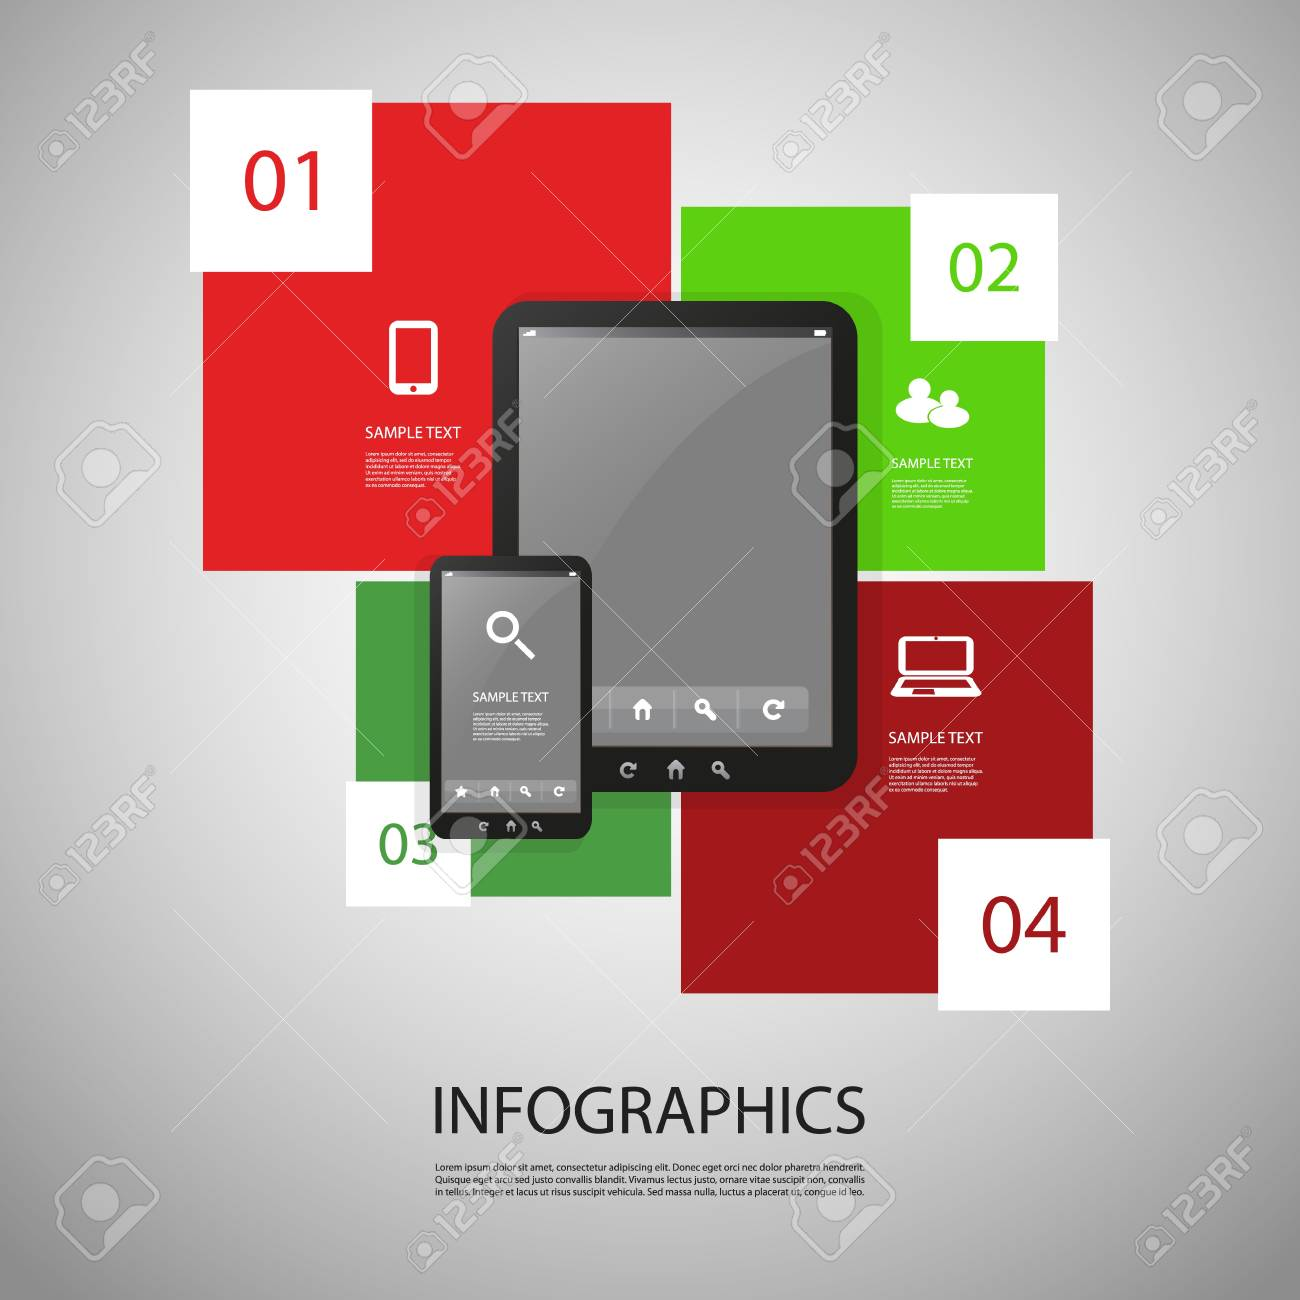 Infographic Design Stock Vector - 19554974